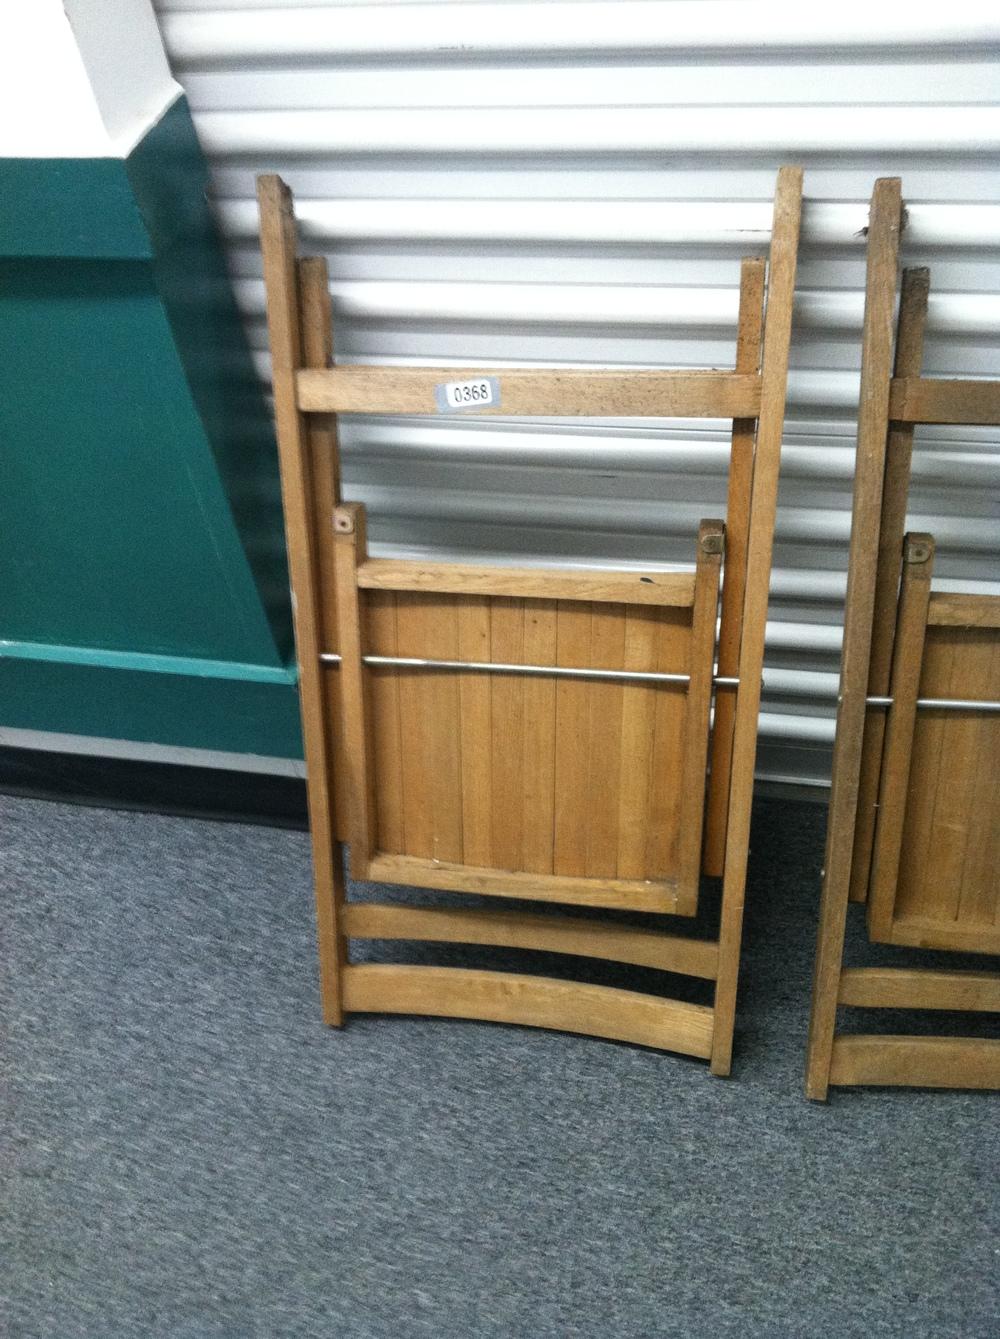 0368: Wood Folding Chair